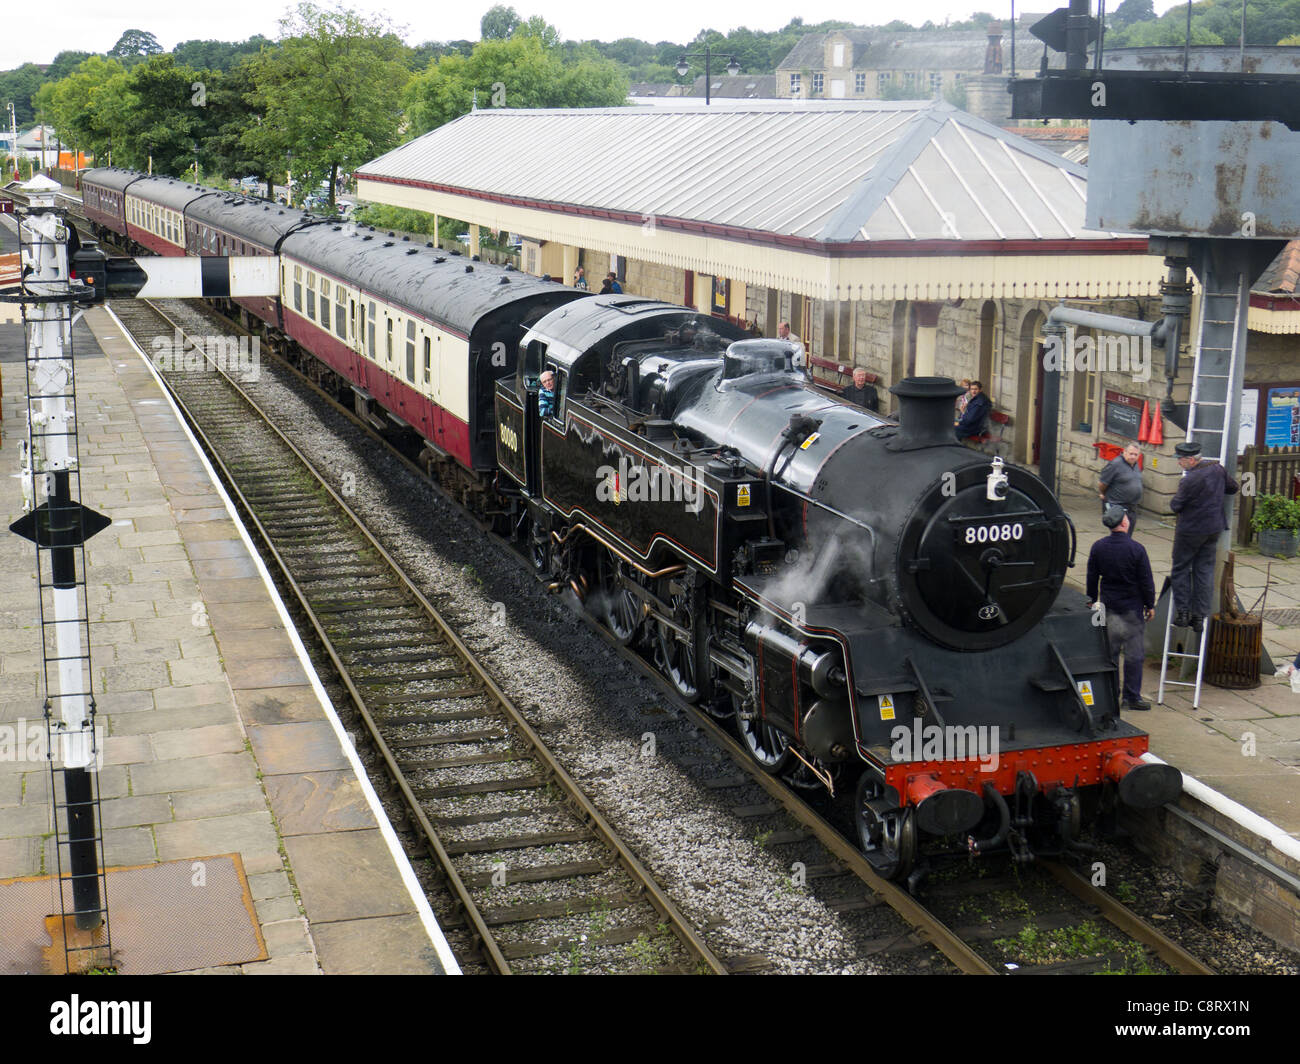 Steam train on East Lancashire Railway at Ramsbottom Station Stock Photo